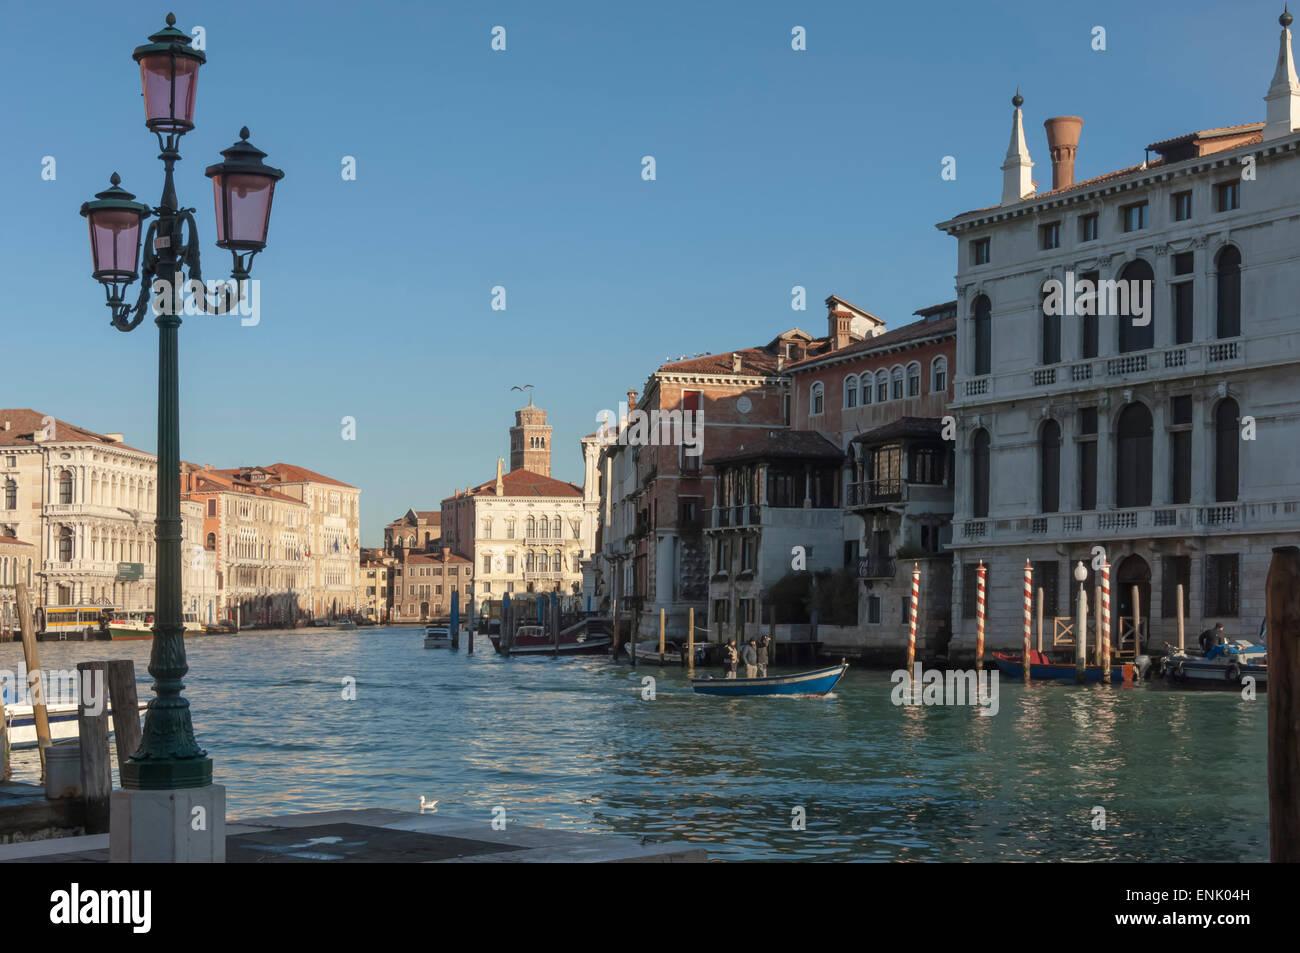 Grand Canal, morning, Venice, UNESCO World Heritage Site, Veneto, Italy, Europe - Stock Image